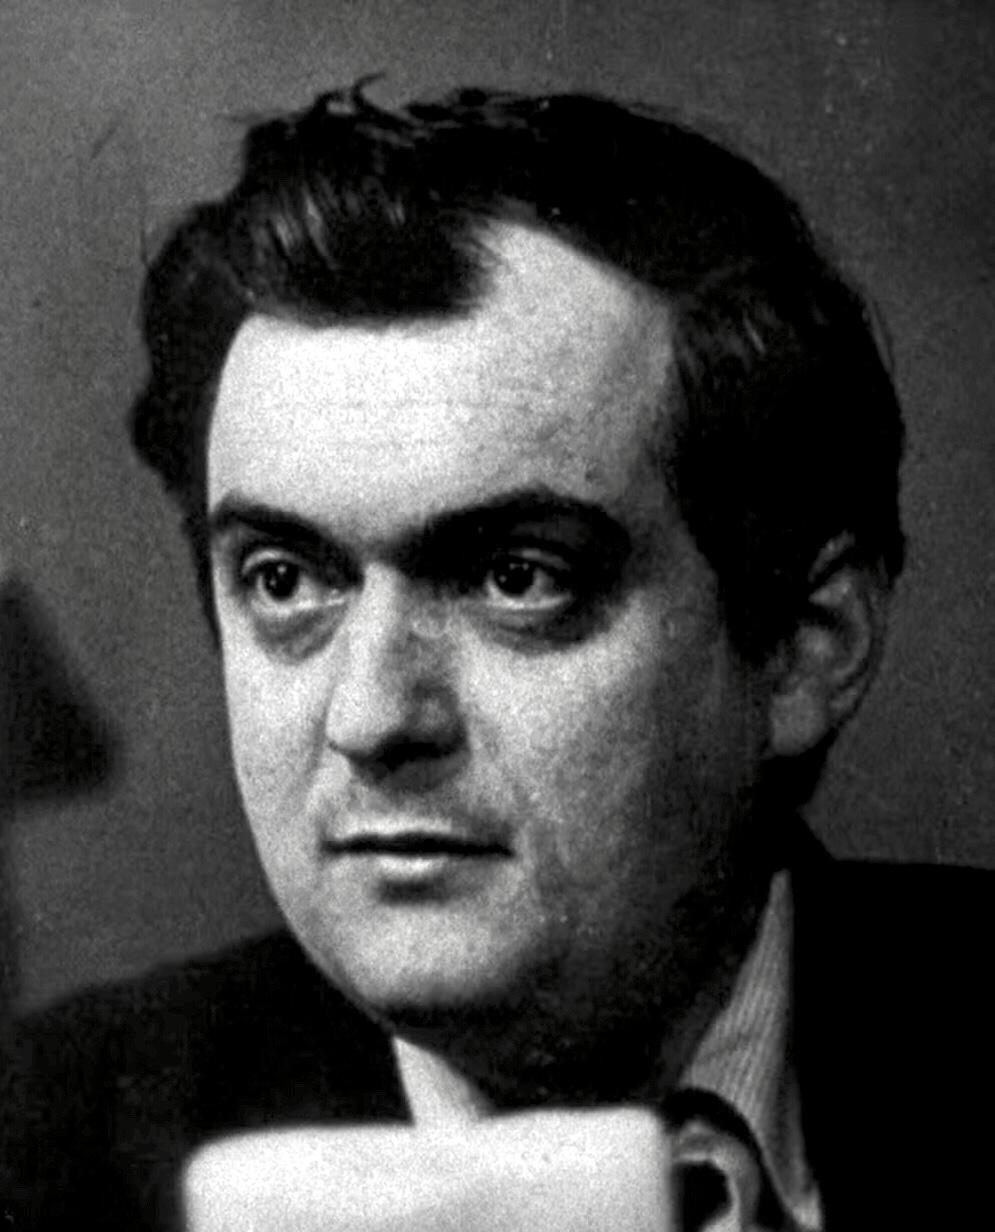 Stanley Kubrick S Unrealized Projects Wikipedia